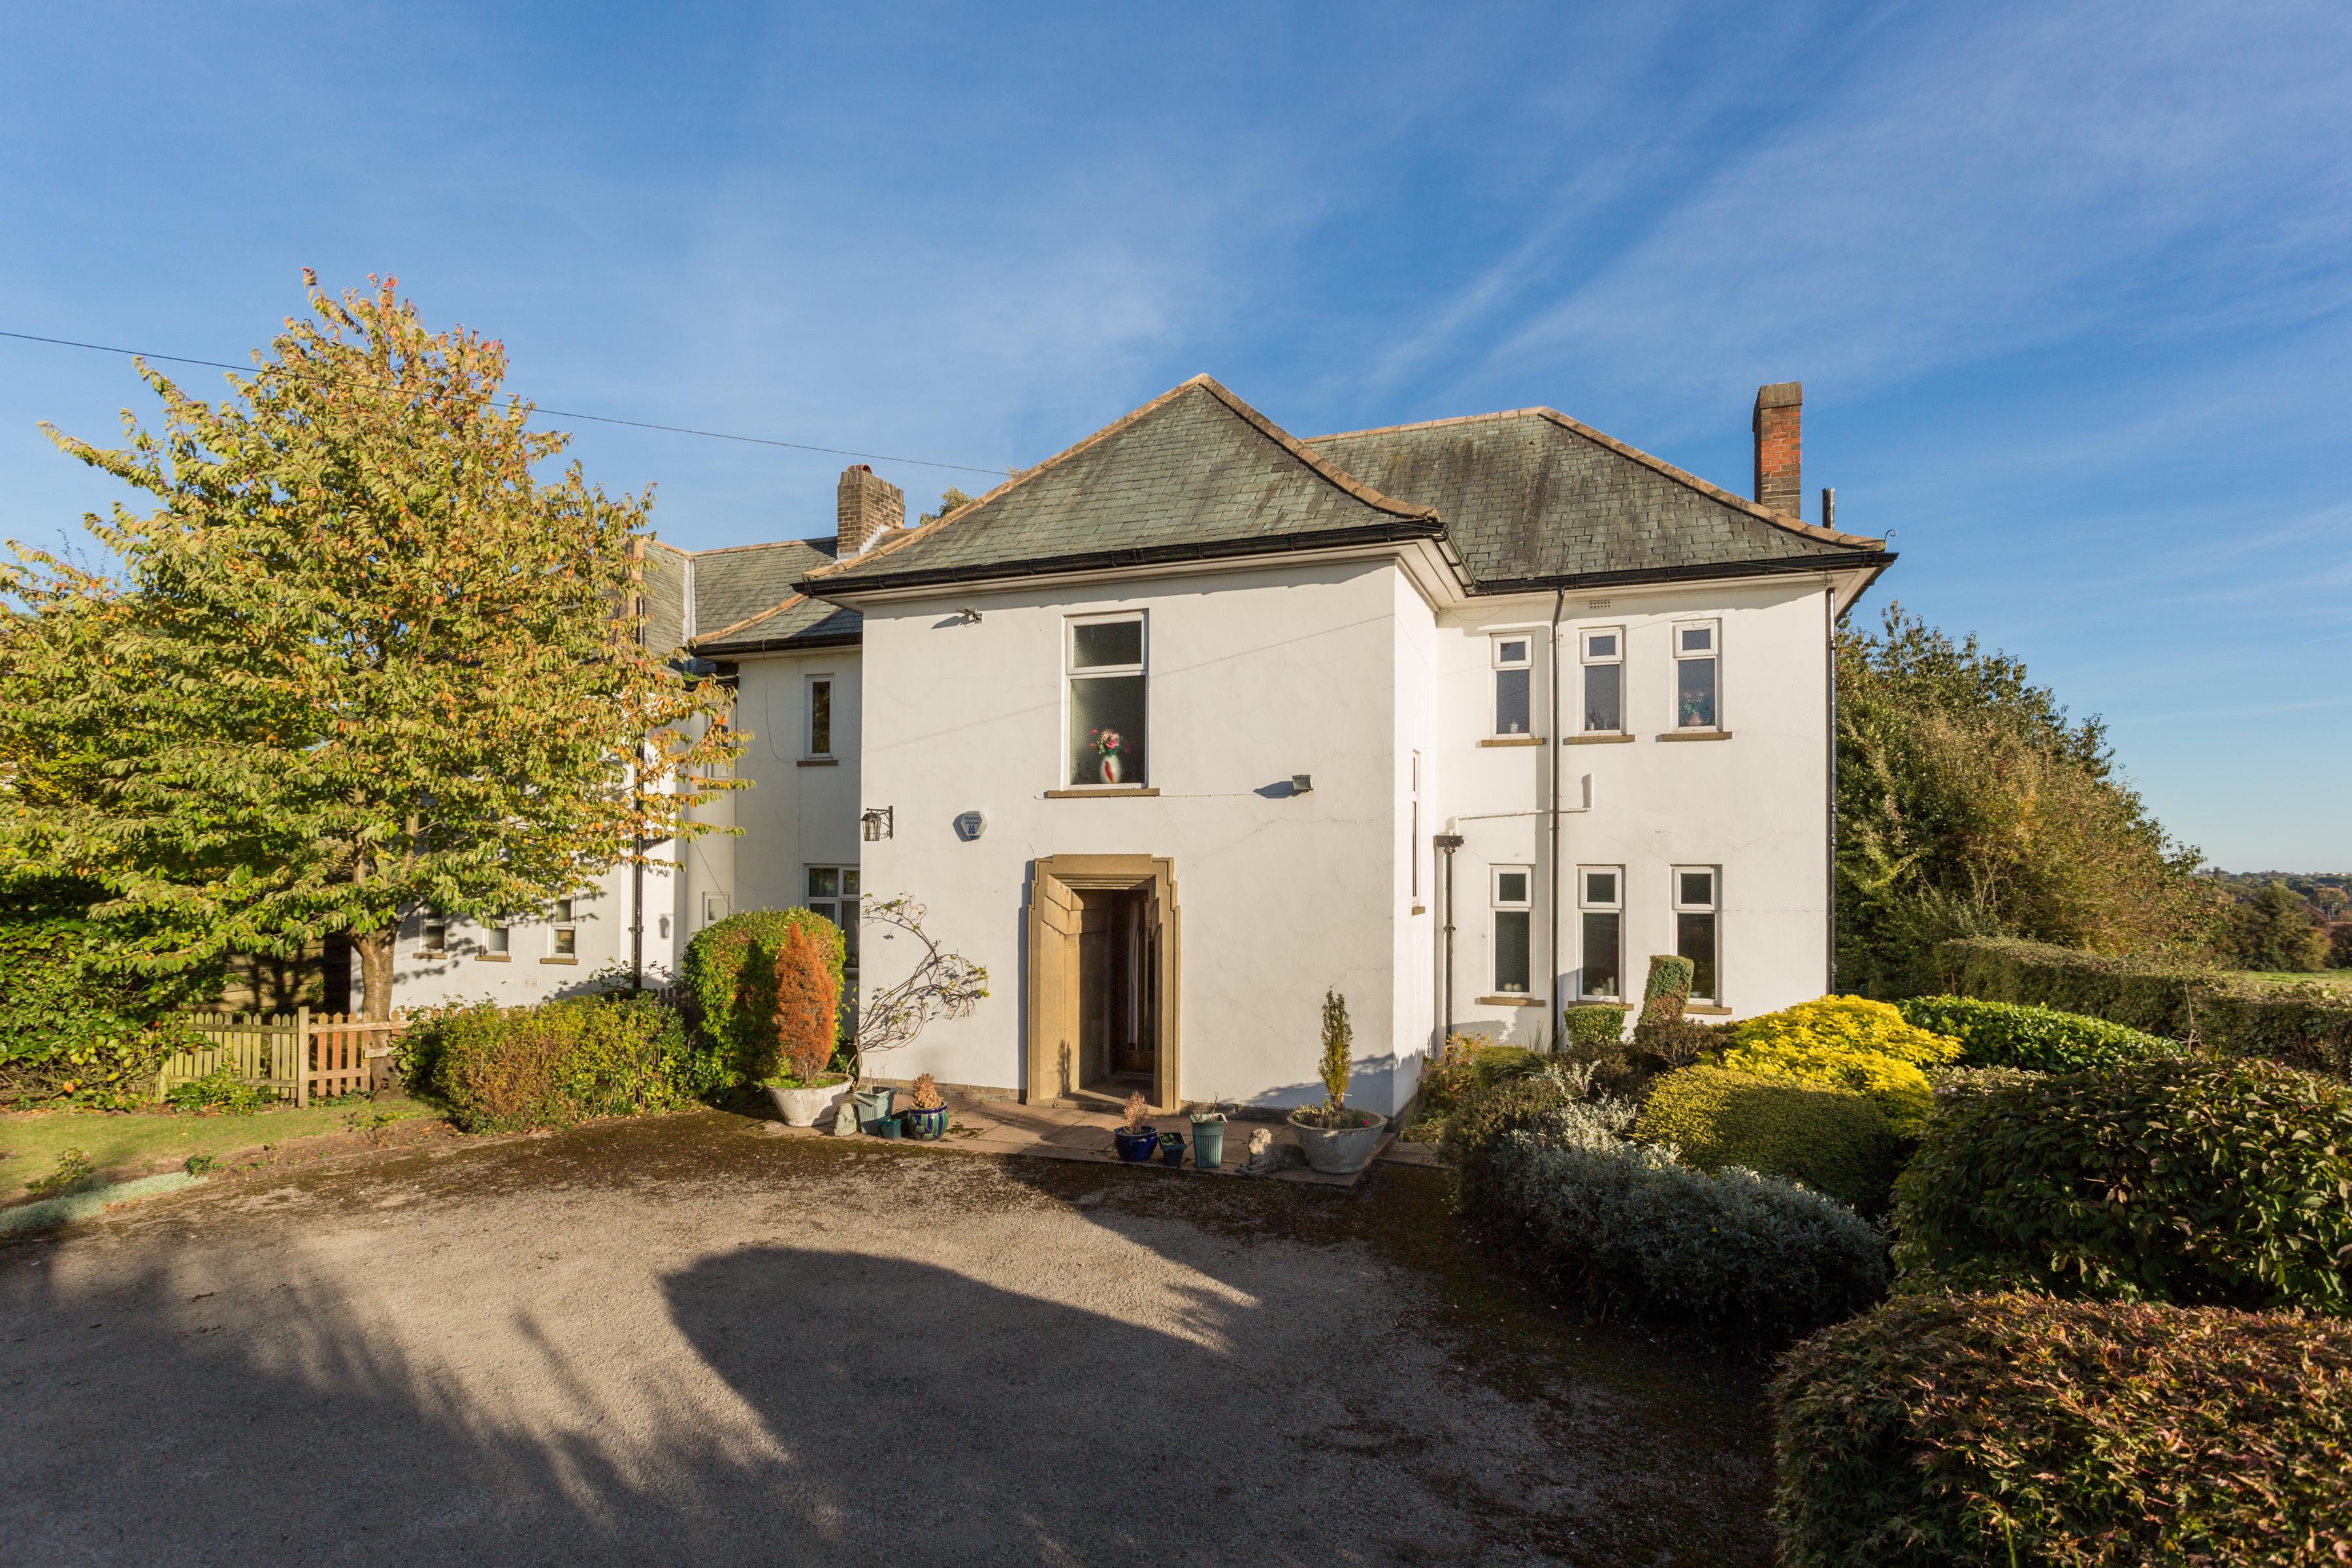 53 Hillfield House, Askham Lane, York - property photo #1